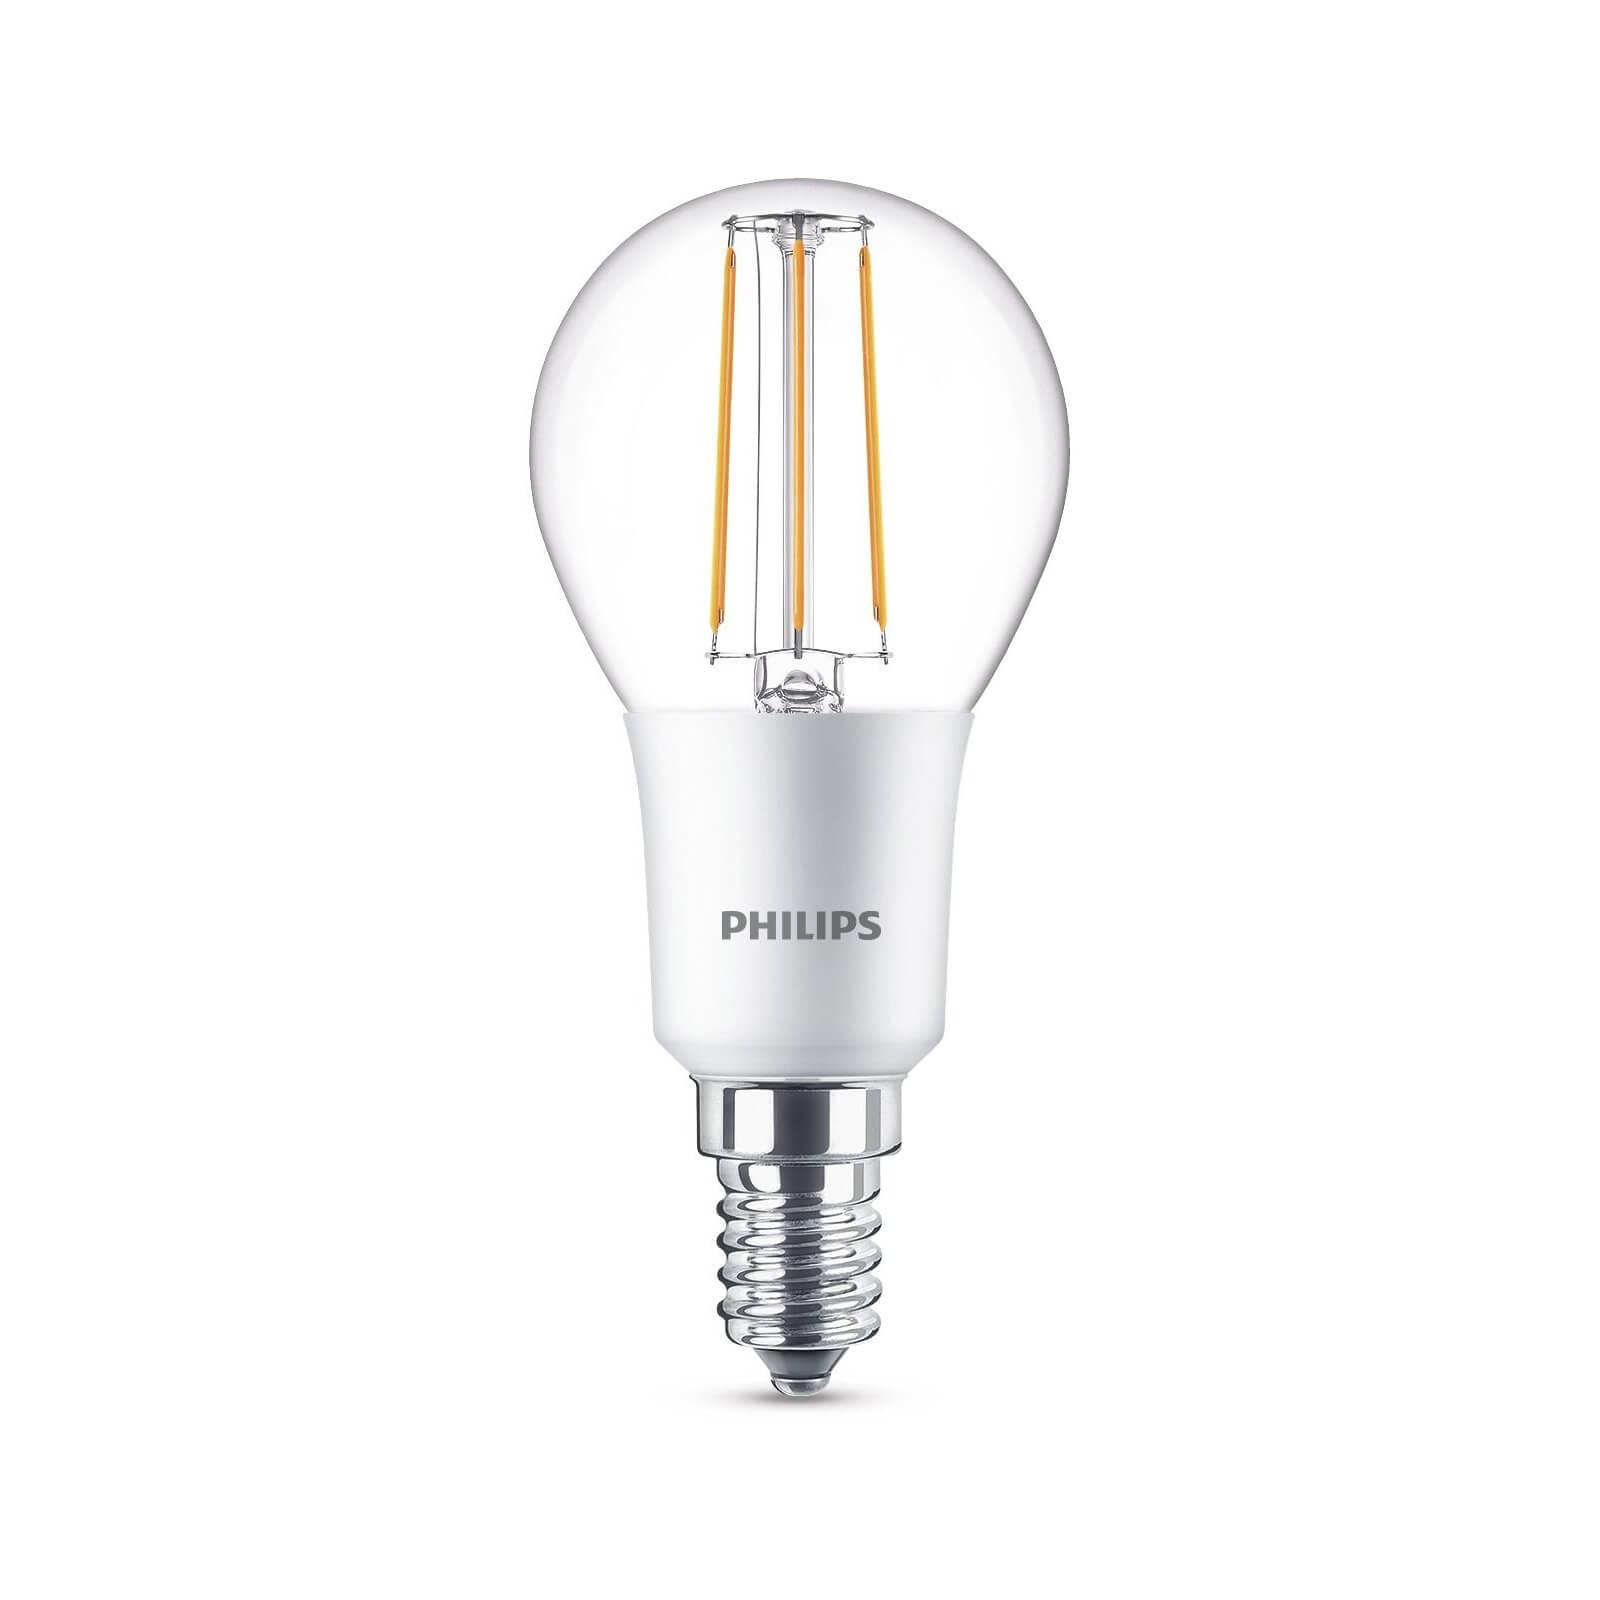 philips led lamp kogel helder 5w 40w e14 dimbaar 8718696575291. Black Bedroom Furniture Sets. Home Design Ideas